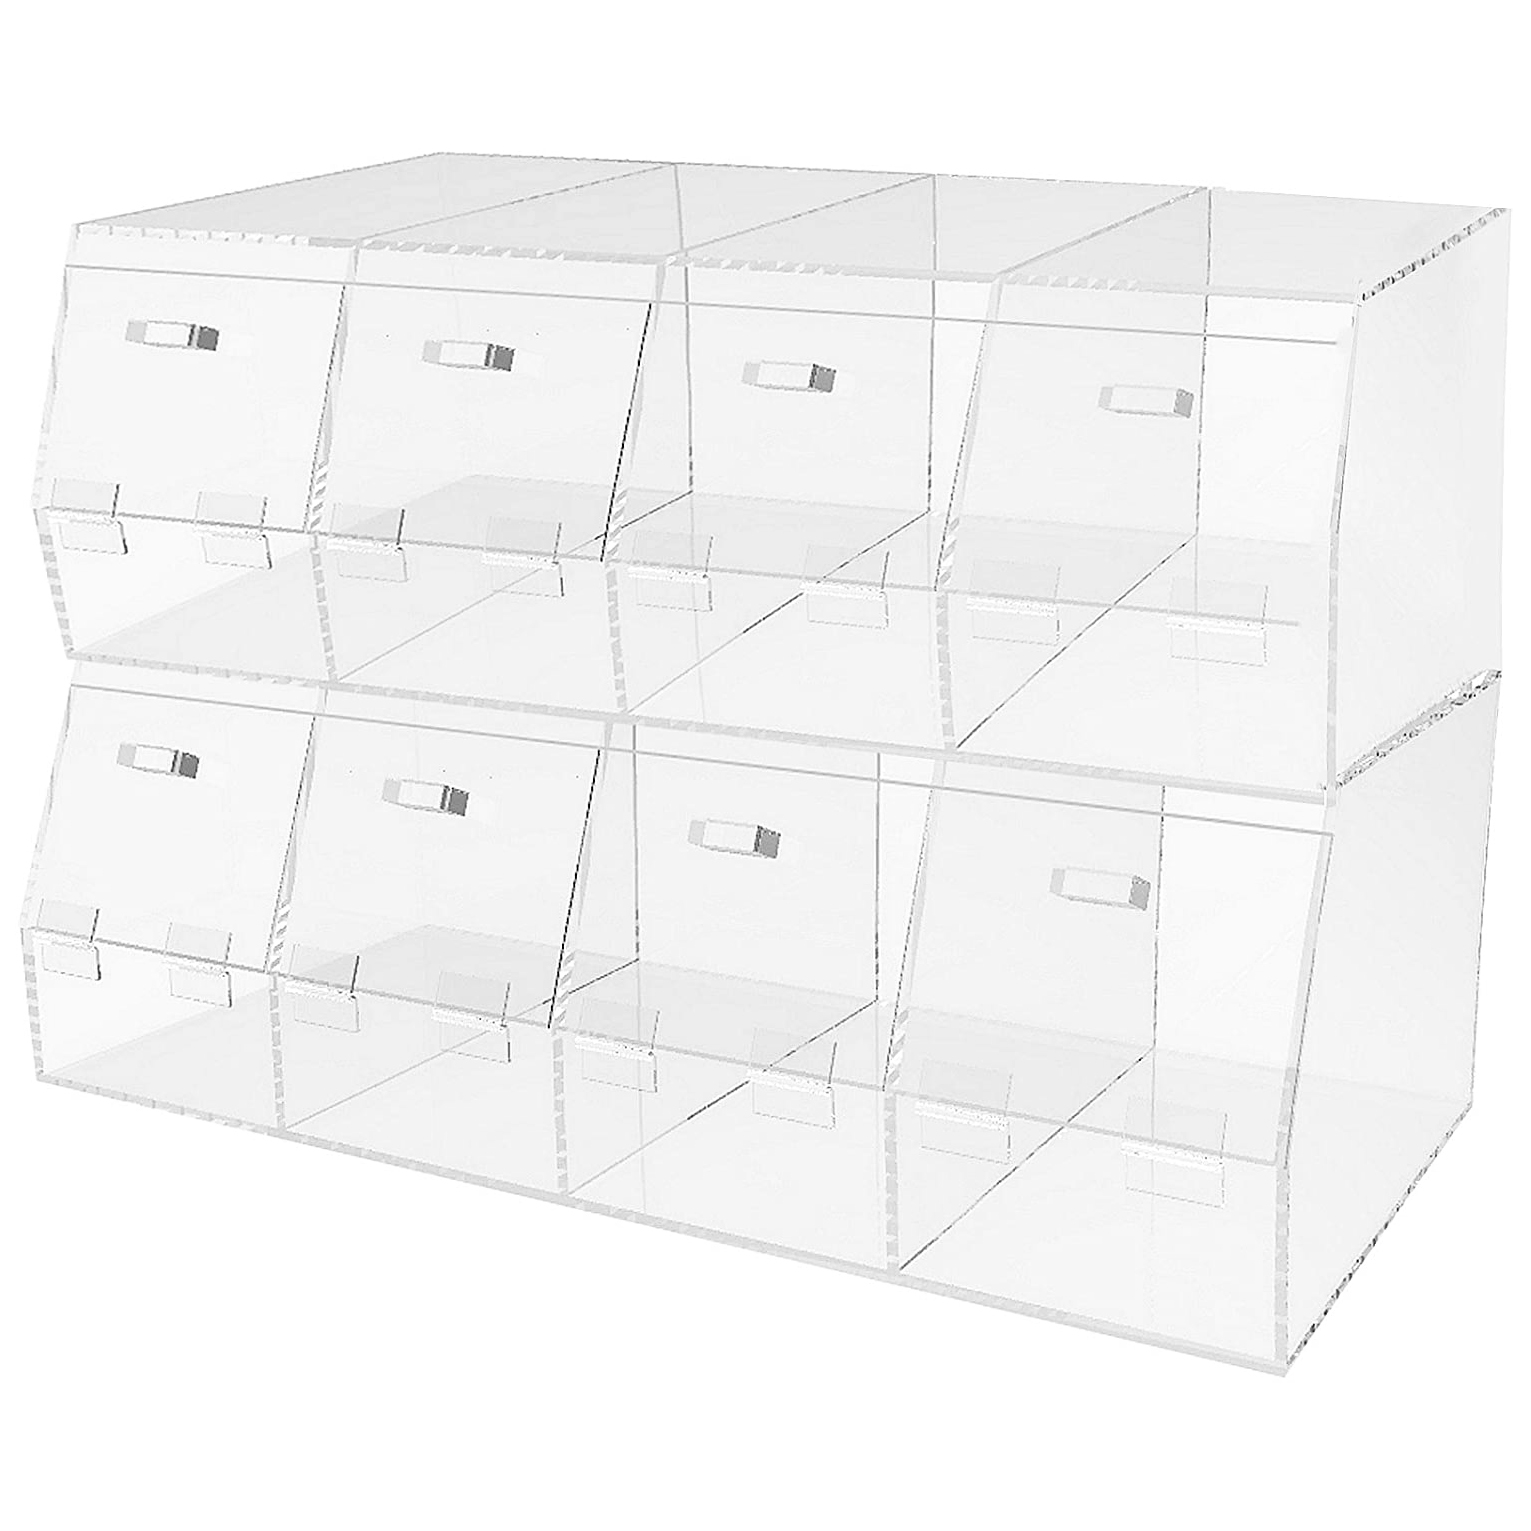 "4 Compartments Large Plexiglass Organizer Bin - 24"" × 12"" × 8"""